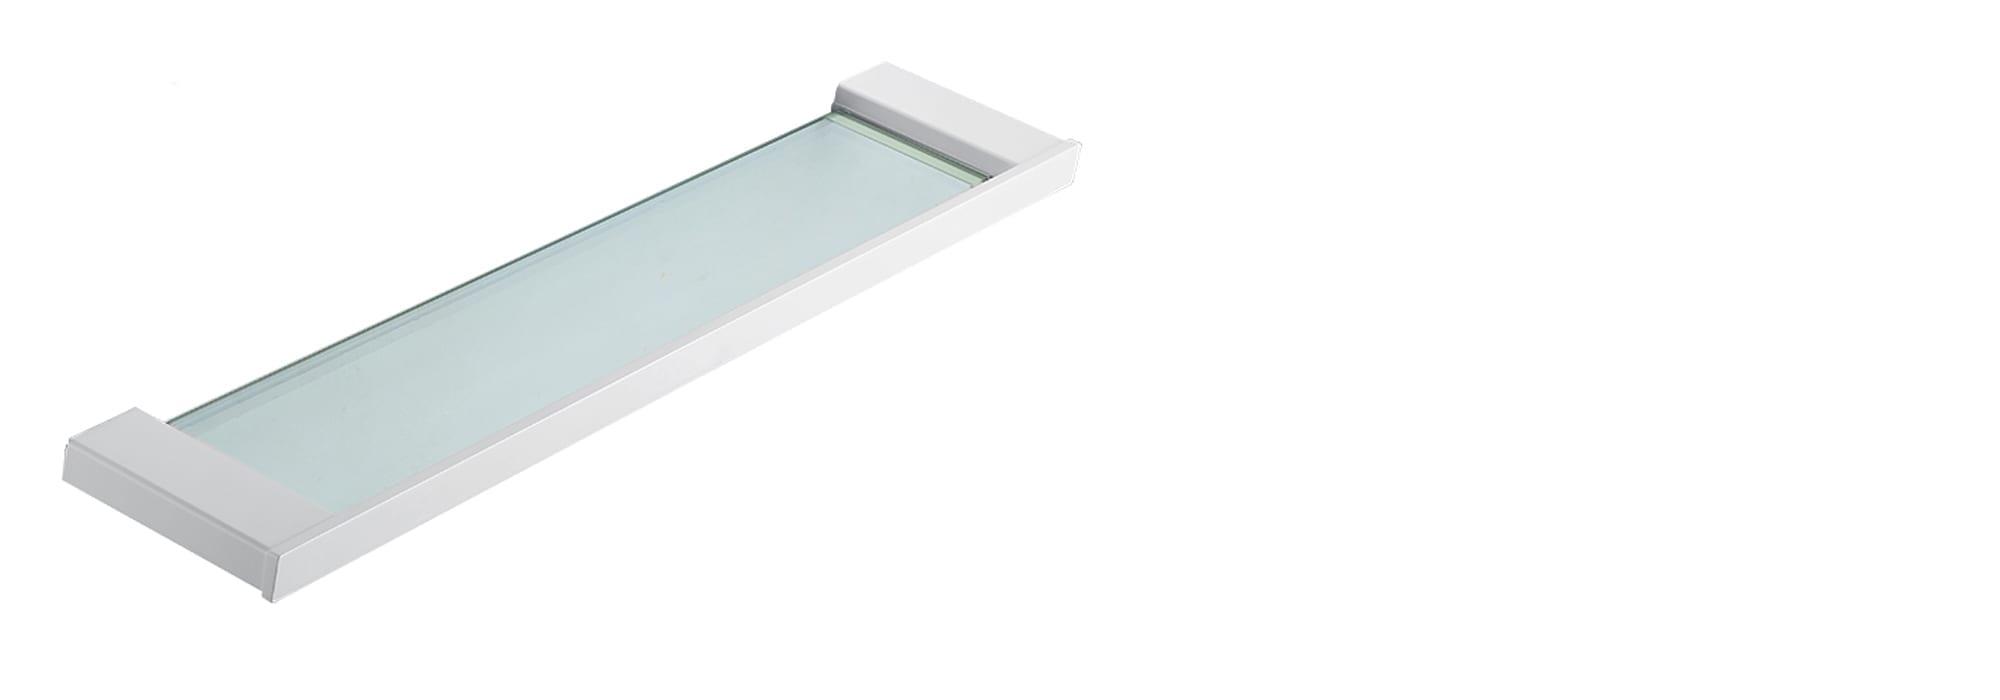 White Minimal Glass Shelf matt by Milstone